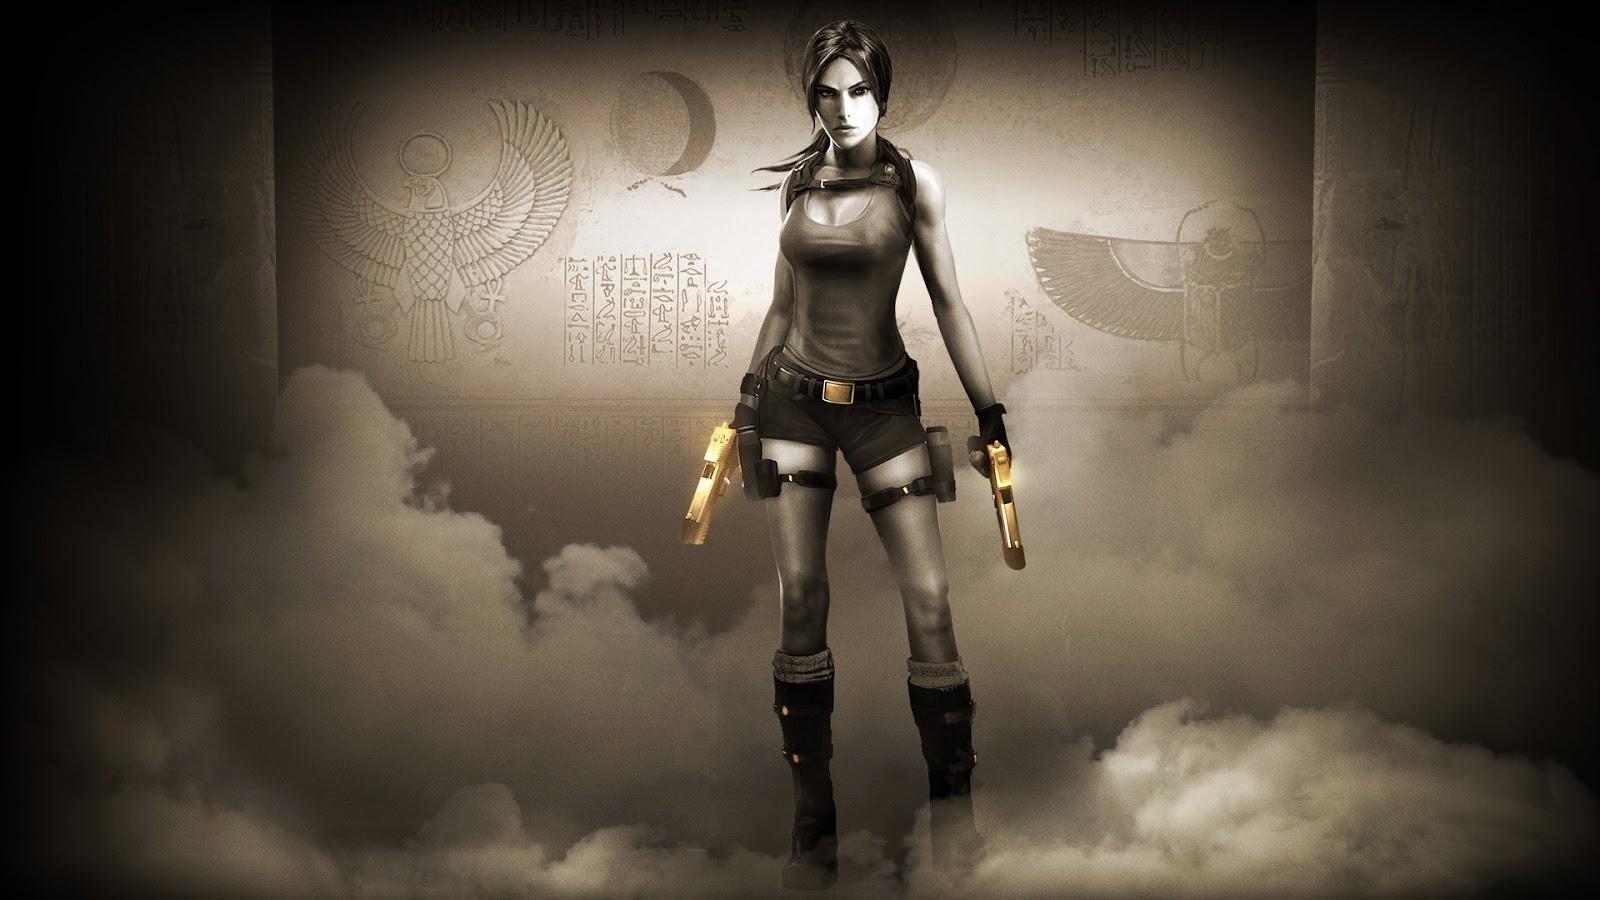 Lara Croft and the Temple of Osiris Puzzles